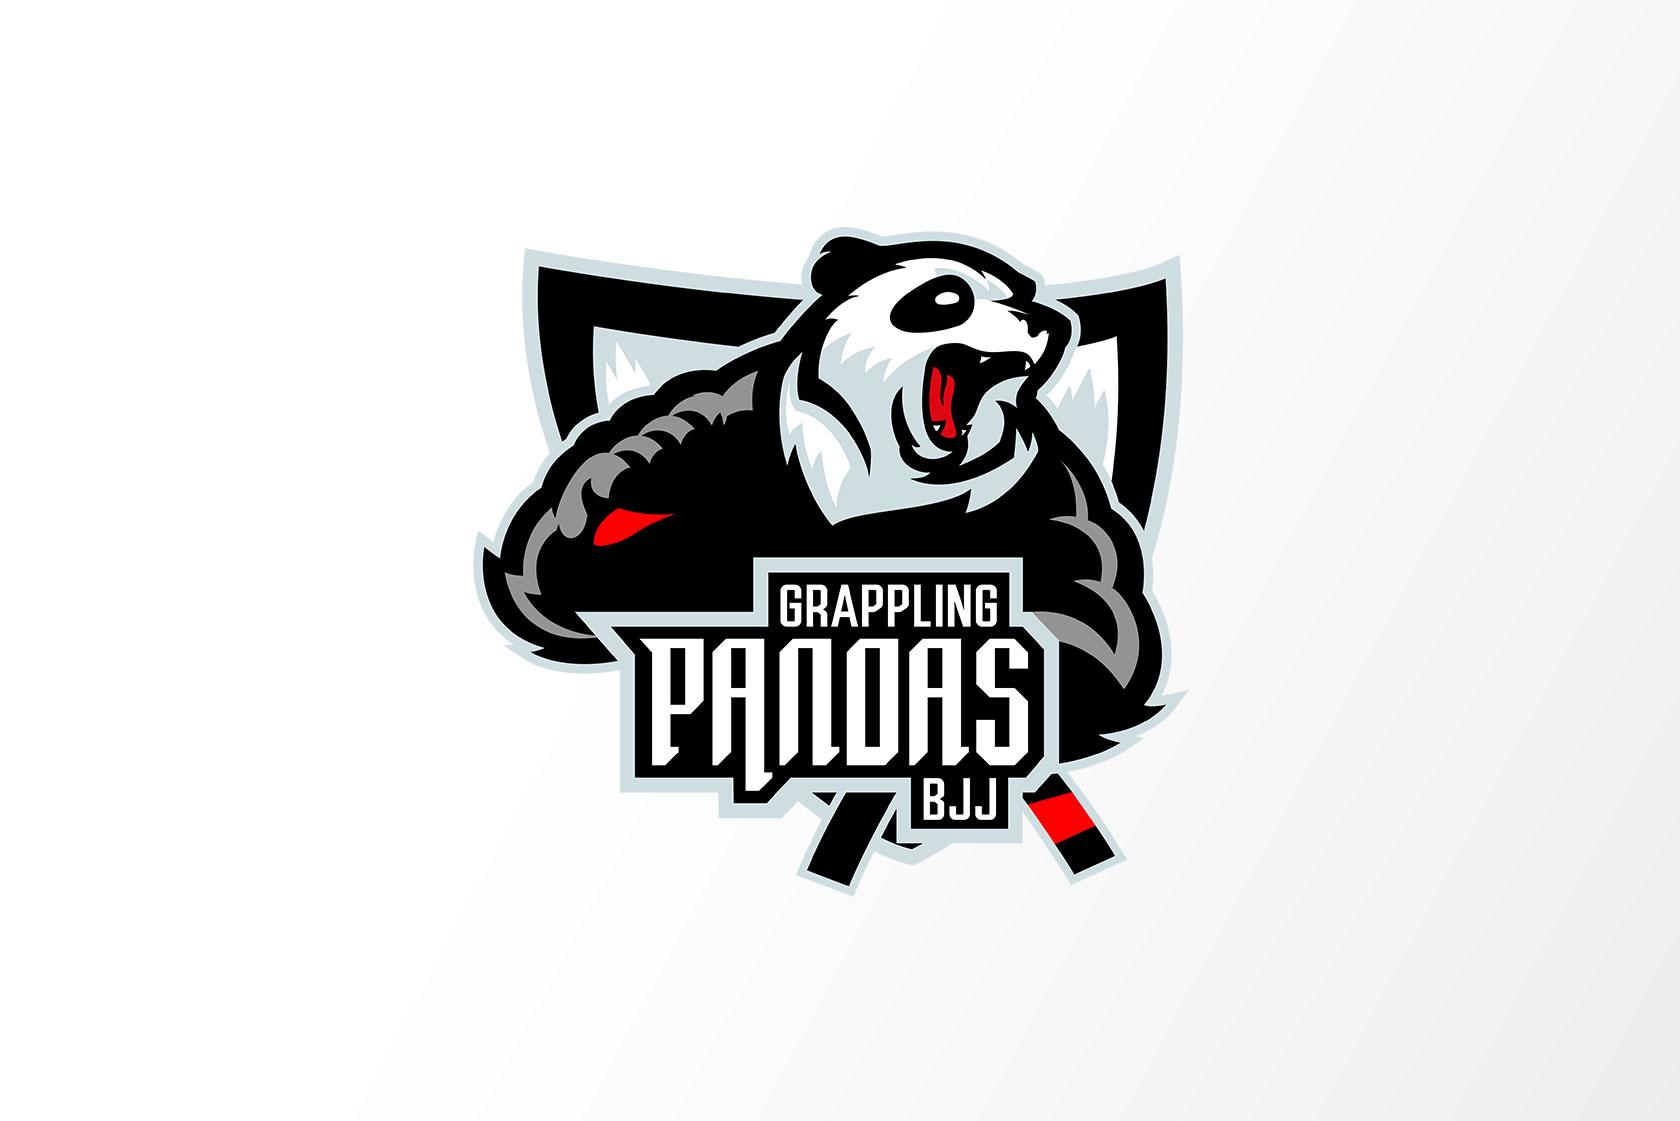 Logo von Grappling Pandas